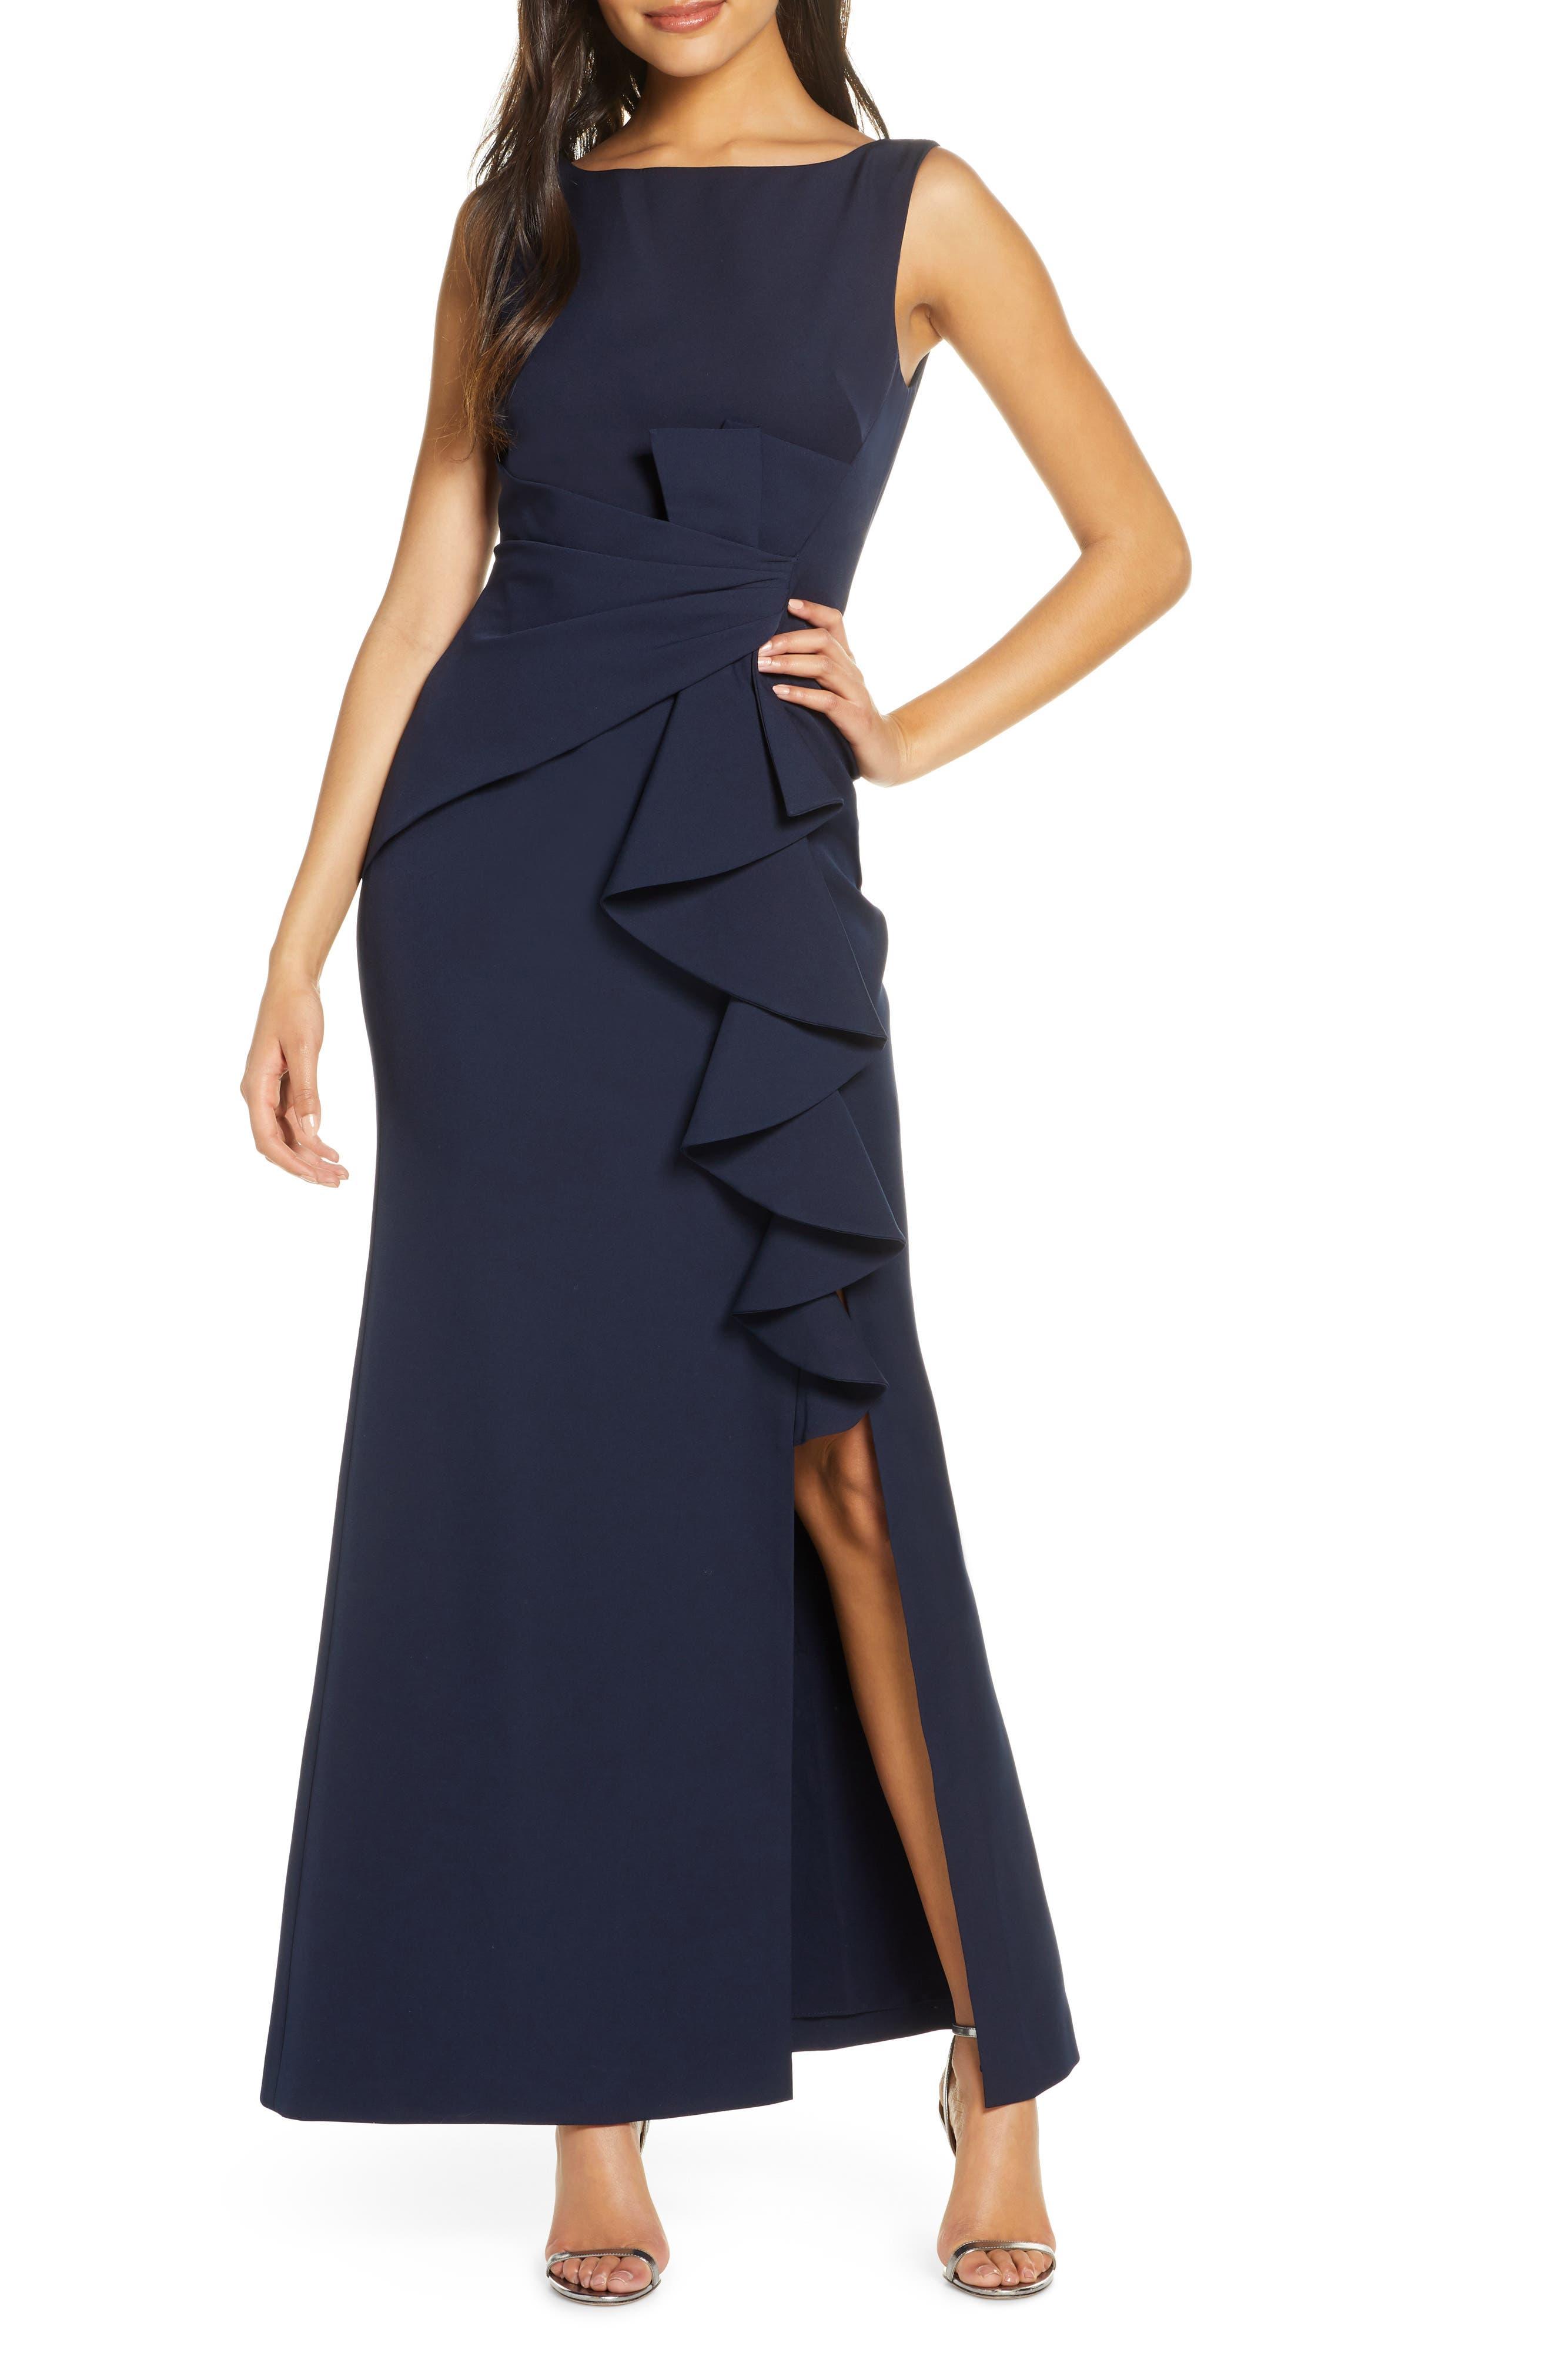 Next Women`s Dress Blue Twist Front Glitter Size 8,10,12 Petite,22